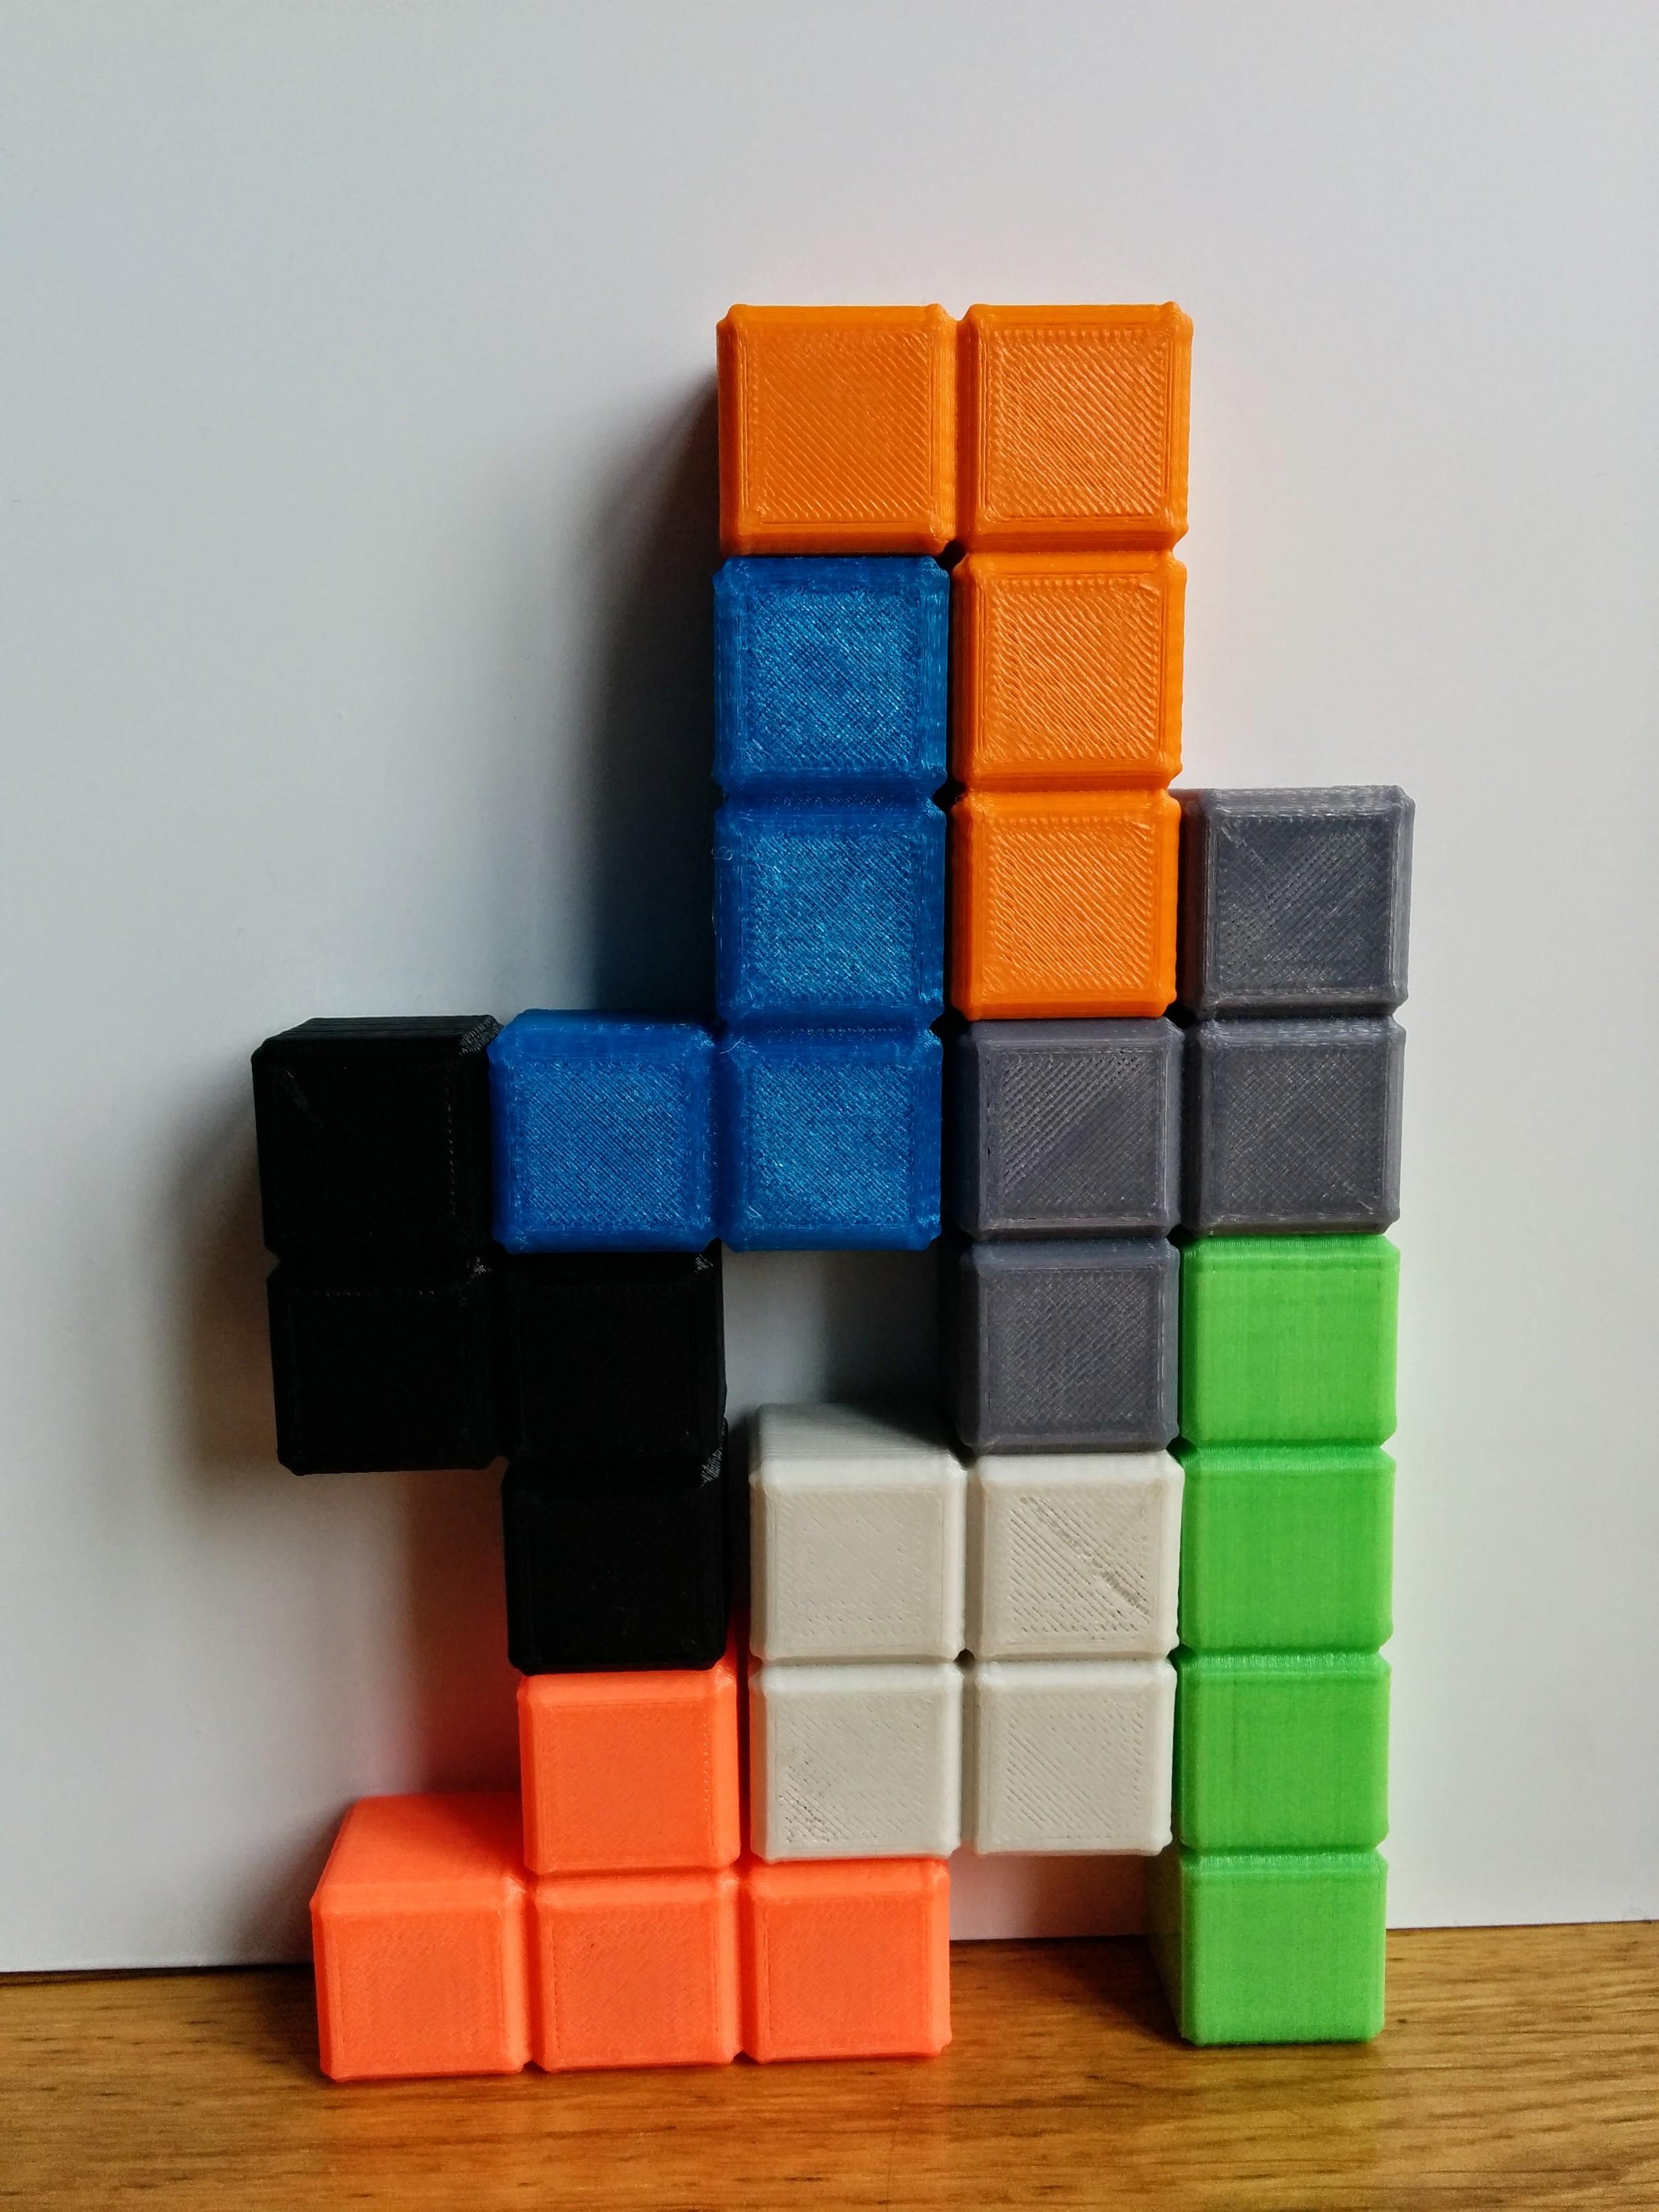 3DPrinted Tetris